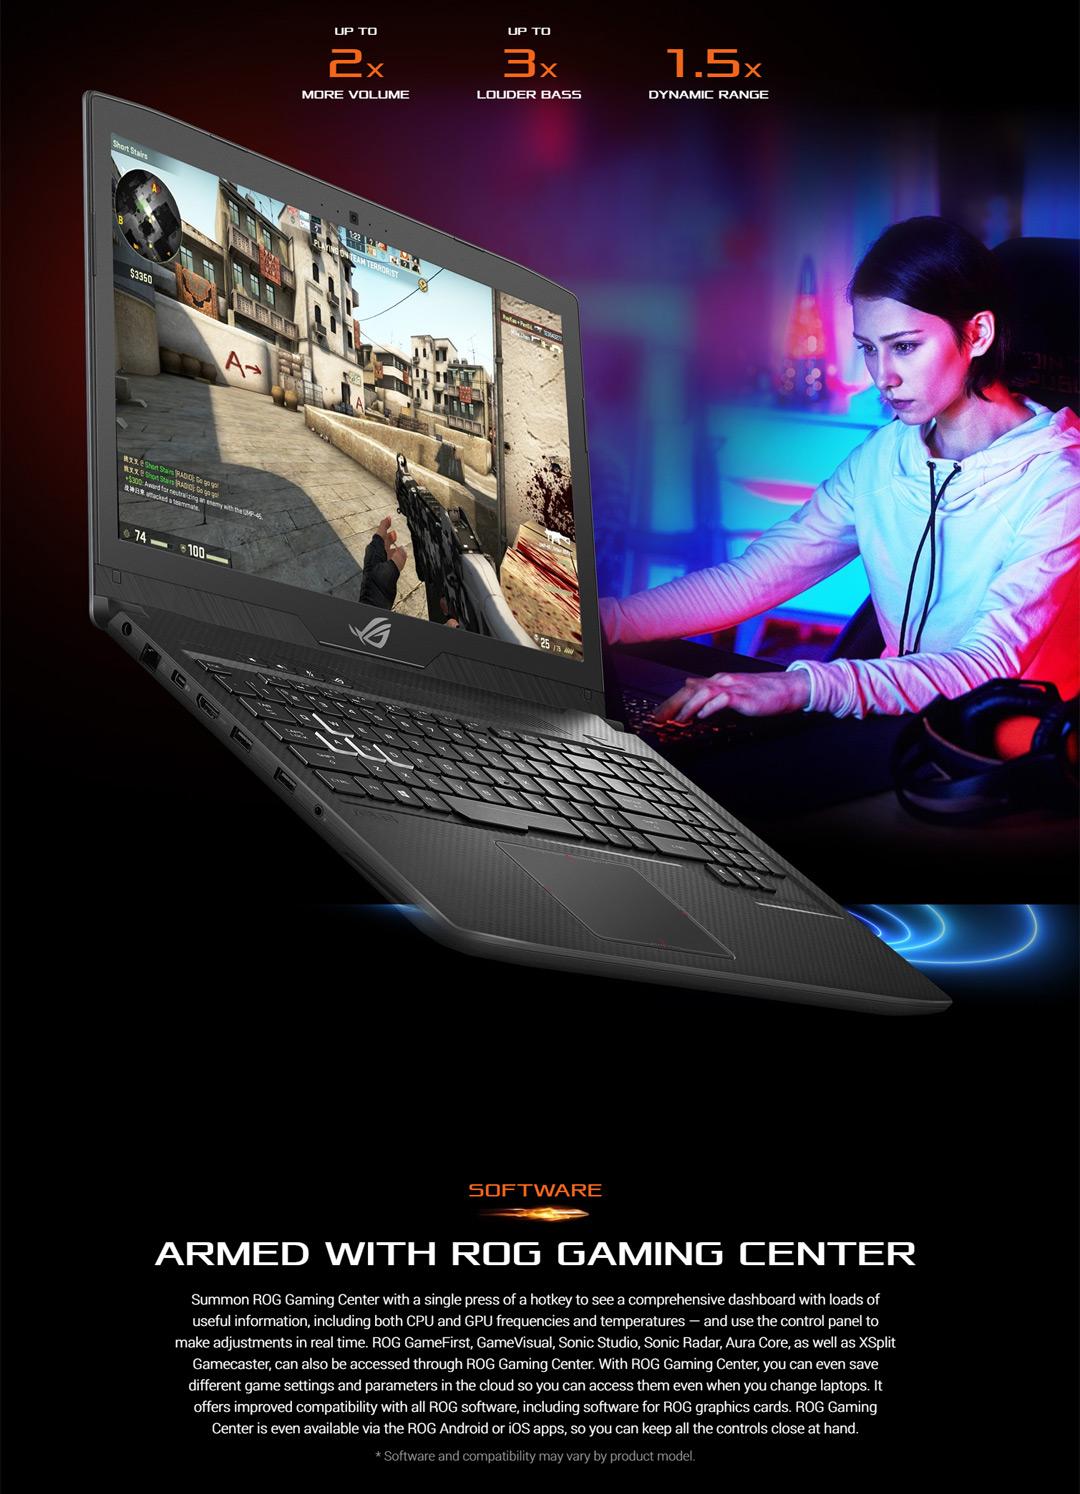 Asus ROG Strix GL504GW-DS74 SCAR Edition, nVidia RTX 2070 8GB, 8th Gen  Intel Core i7-8750H